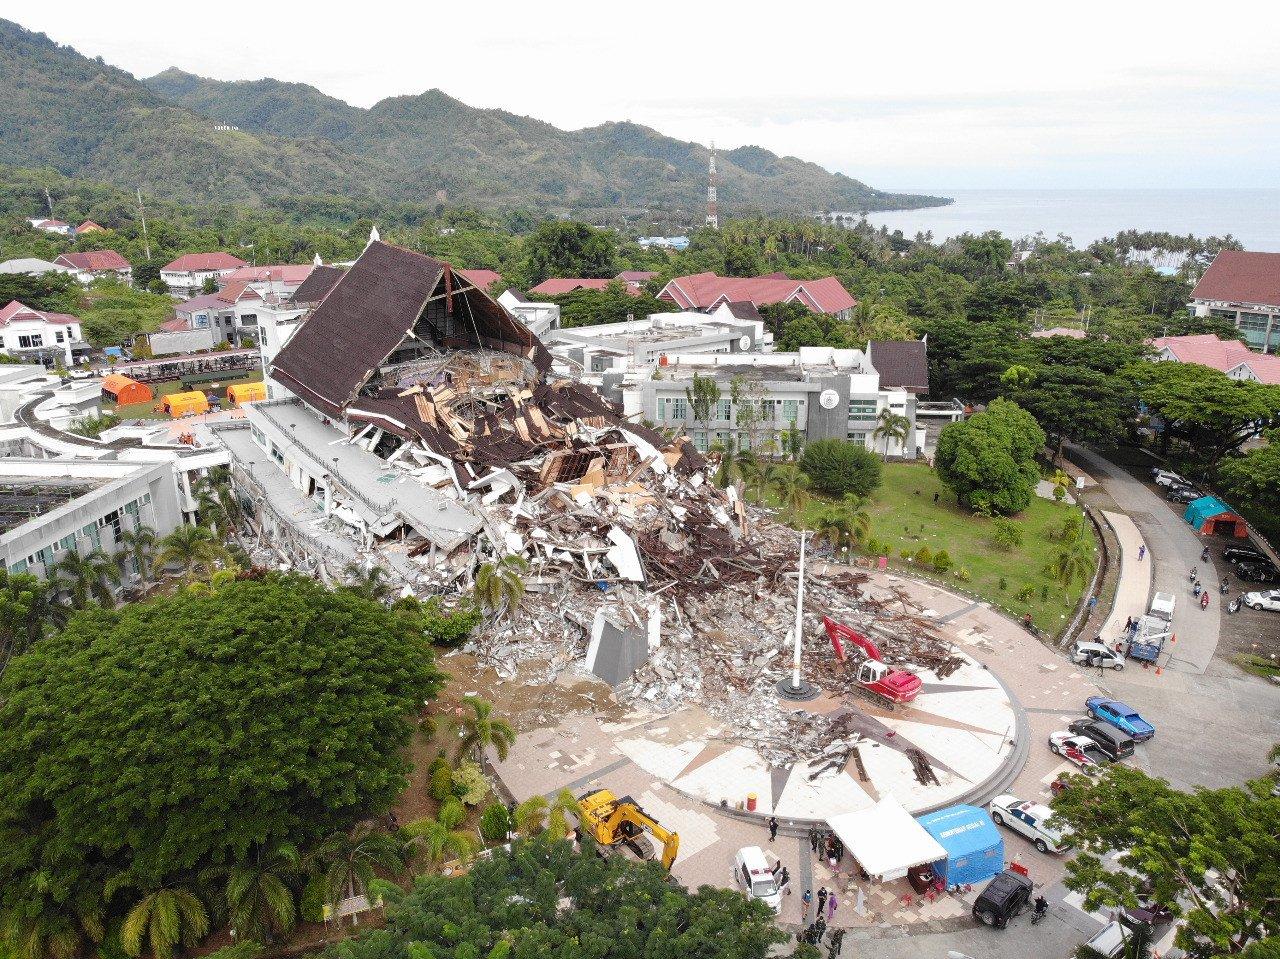 Inilah Daftar Daerah Rawan Gempa Berdasar Data BMKG, Waspadalah! - JPNN.com